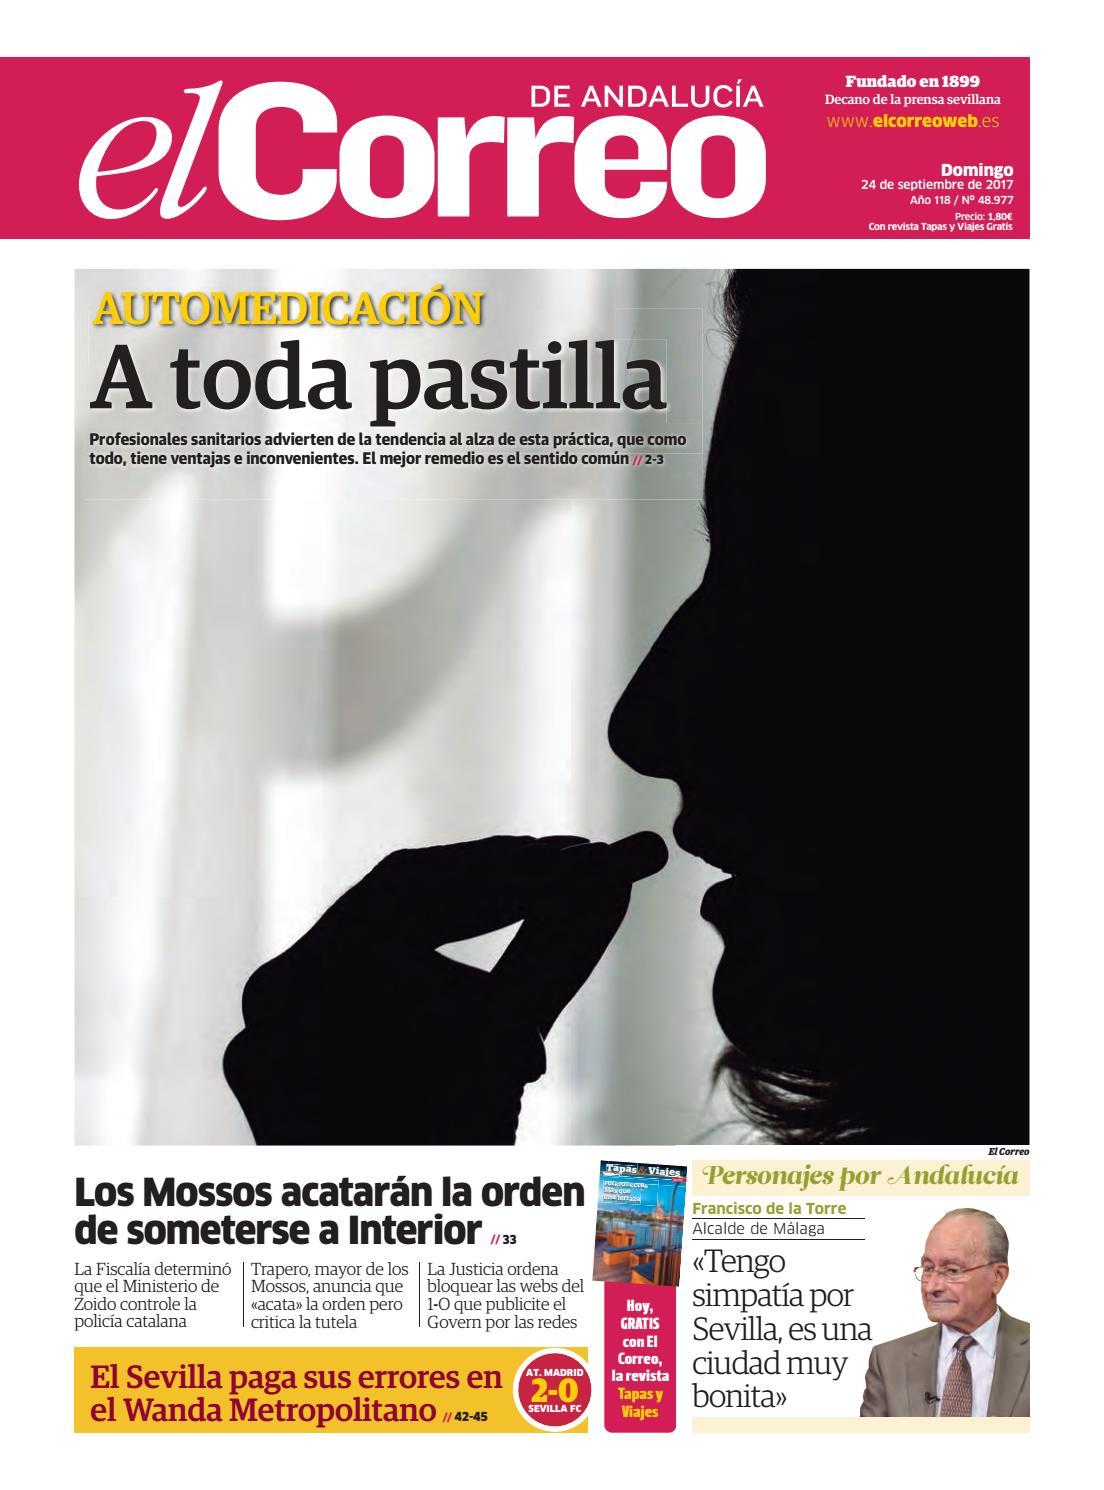 24.09.2017 El Correo de Andalucía by EL CORREO DE ANDALUCÍA S.L. - issuu db57a5b3467